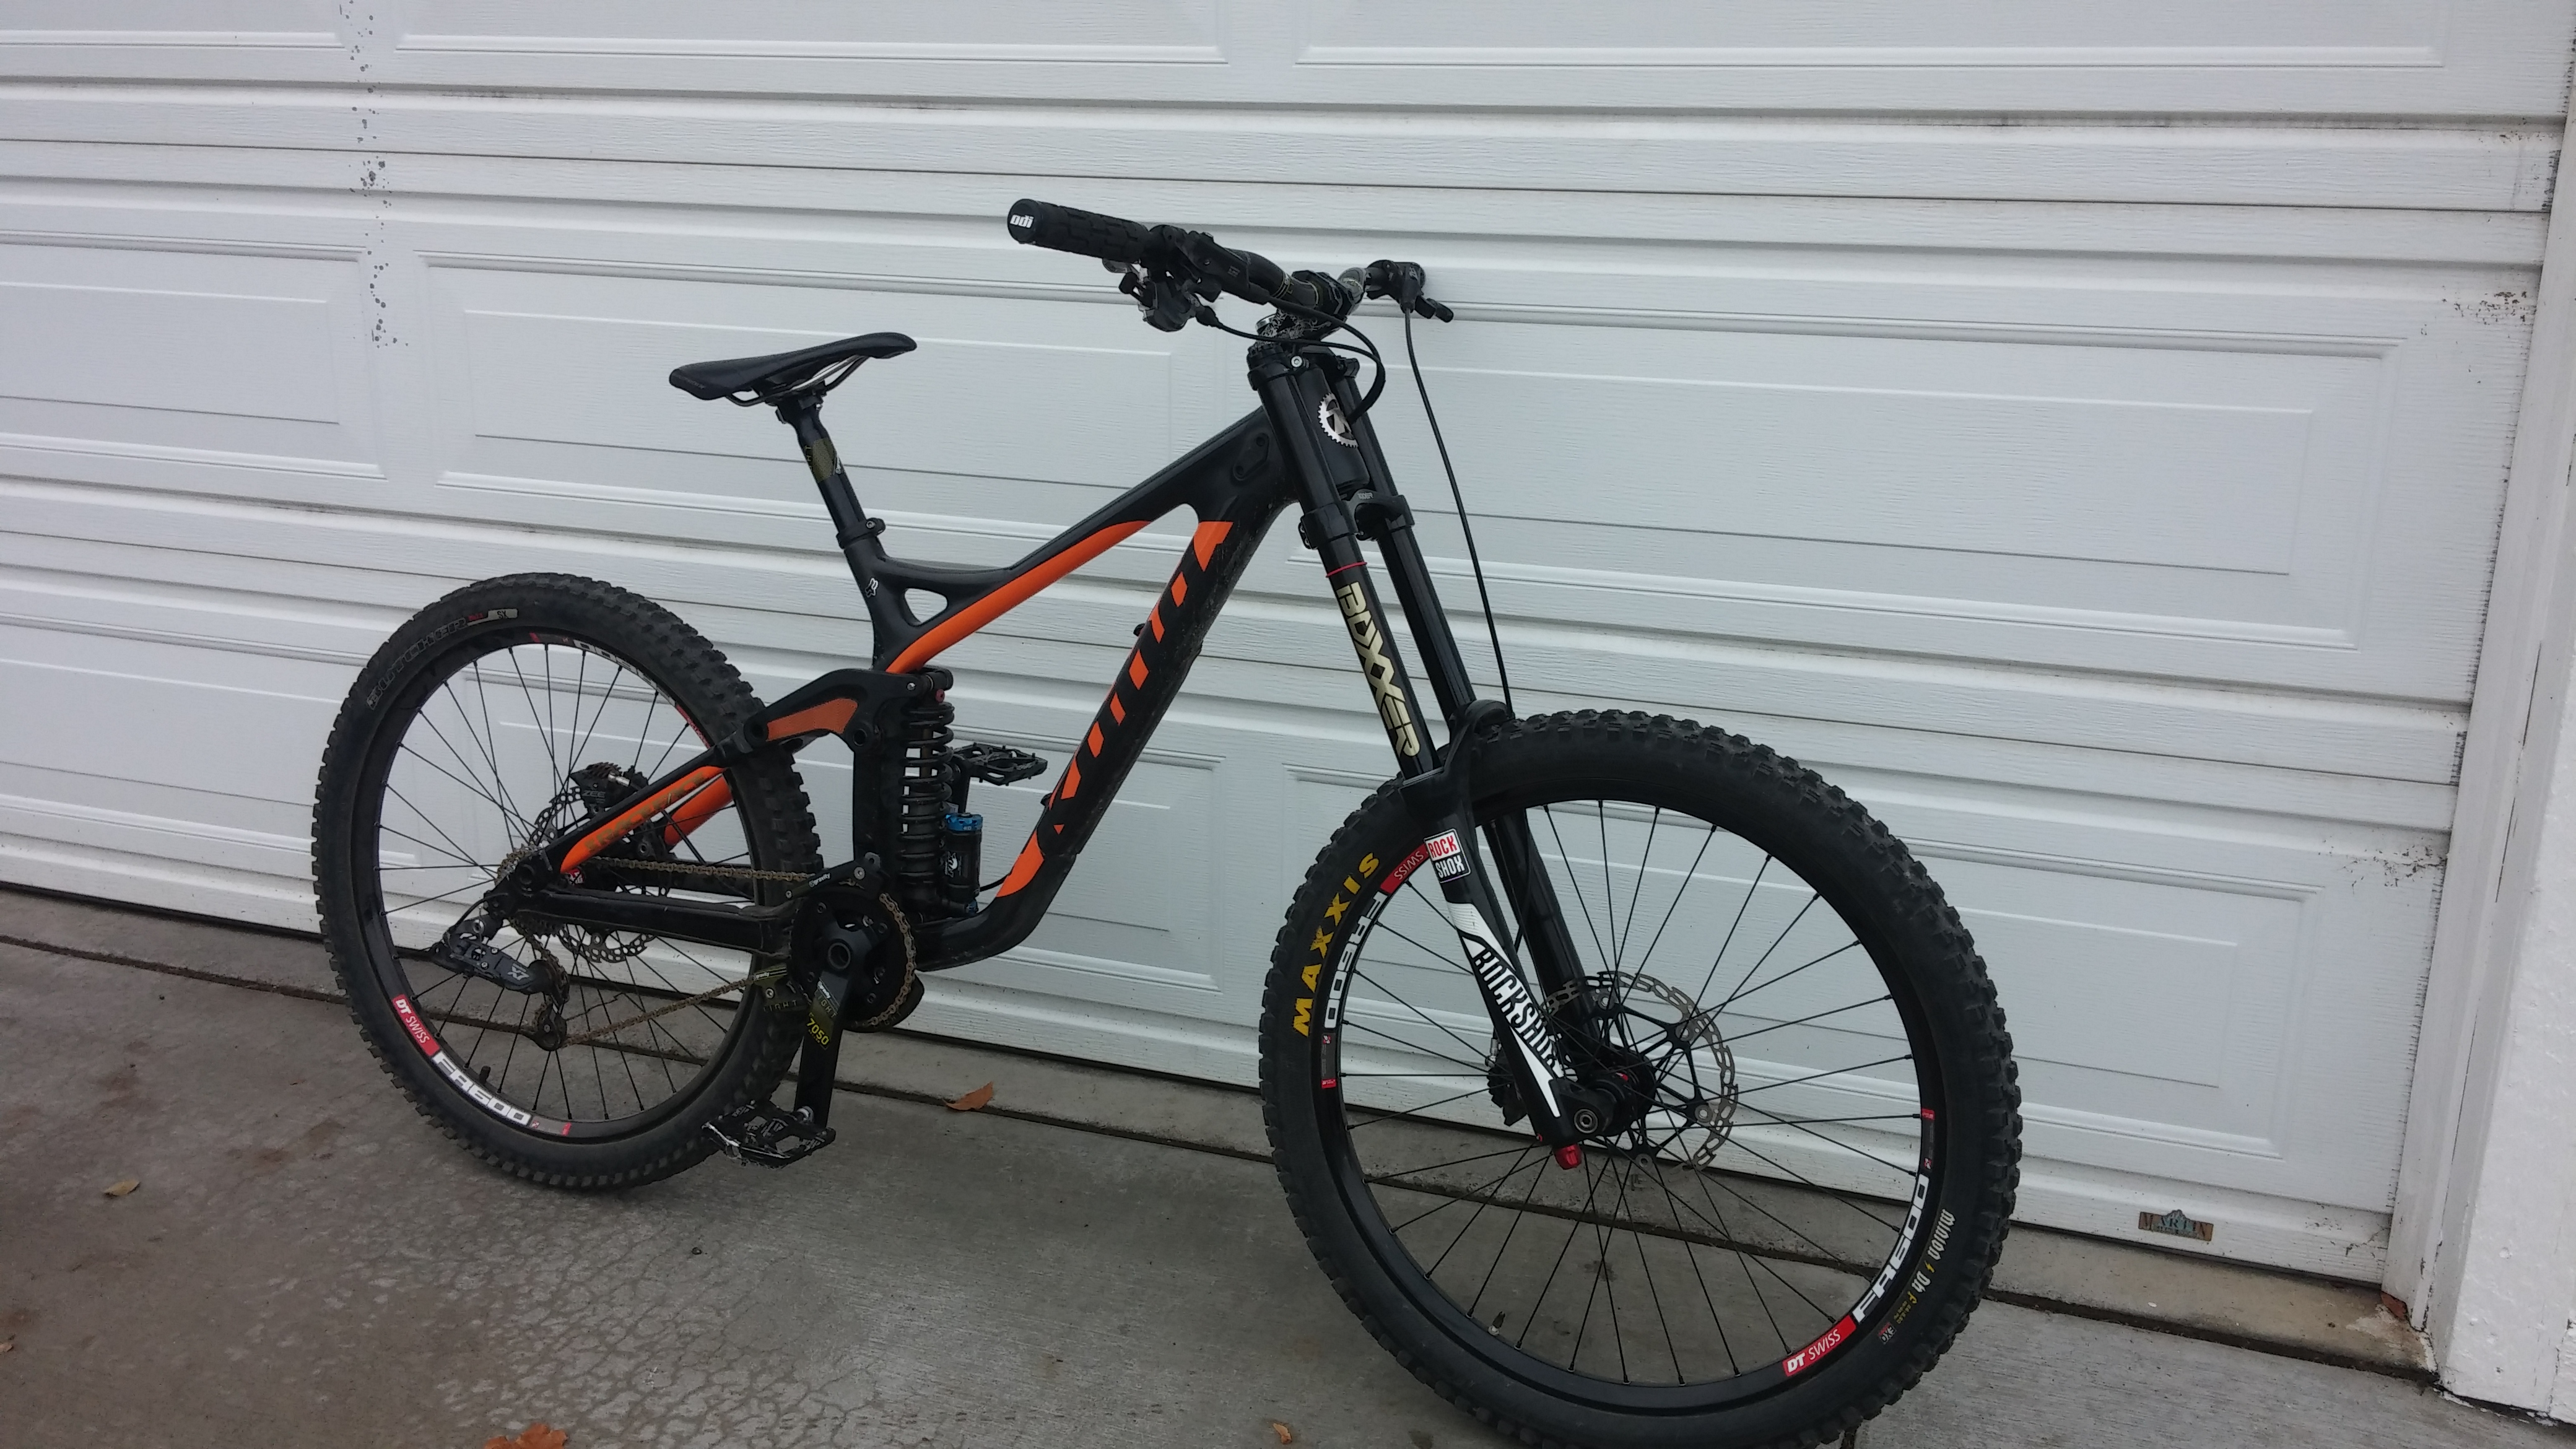 For Sale - 2014 Kona supreme Carbon operator frame w/fox rc4 ...